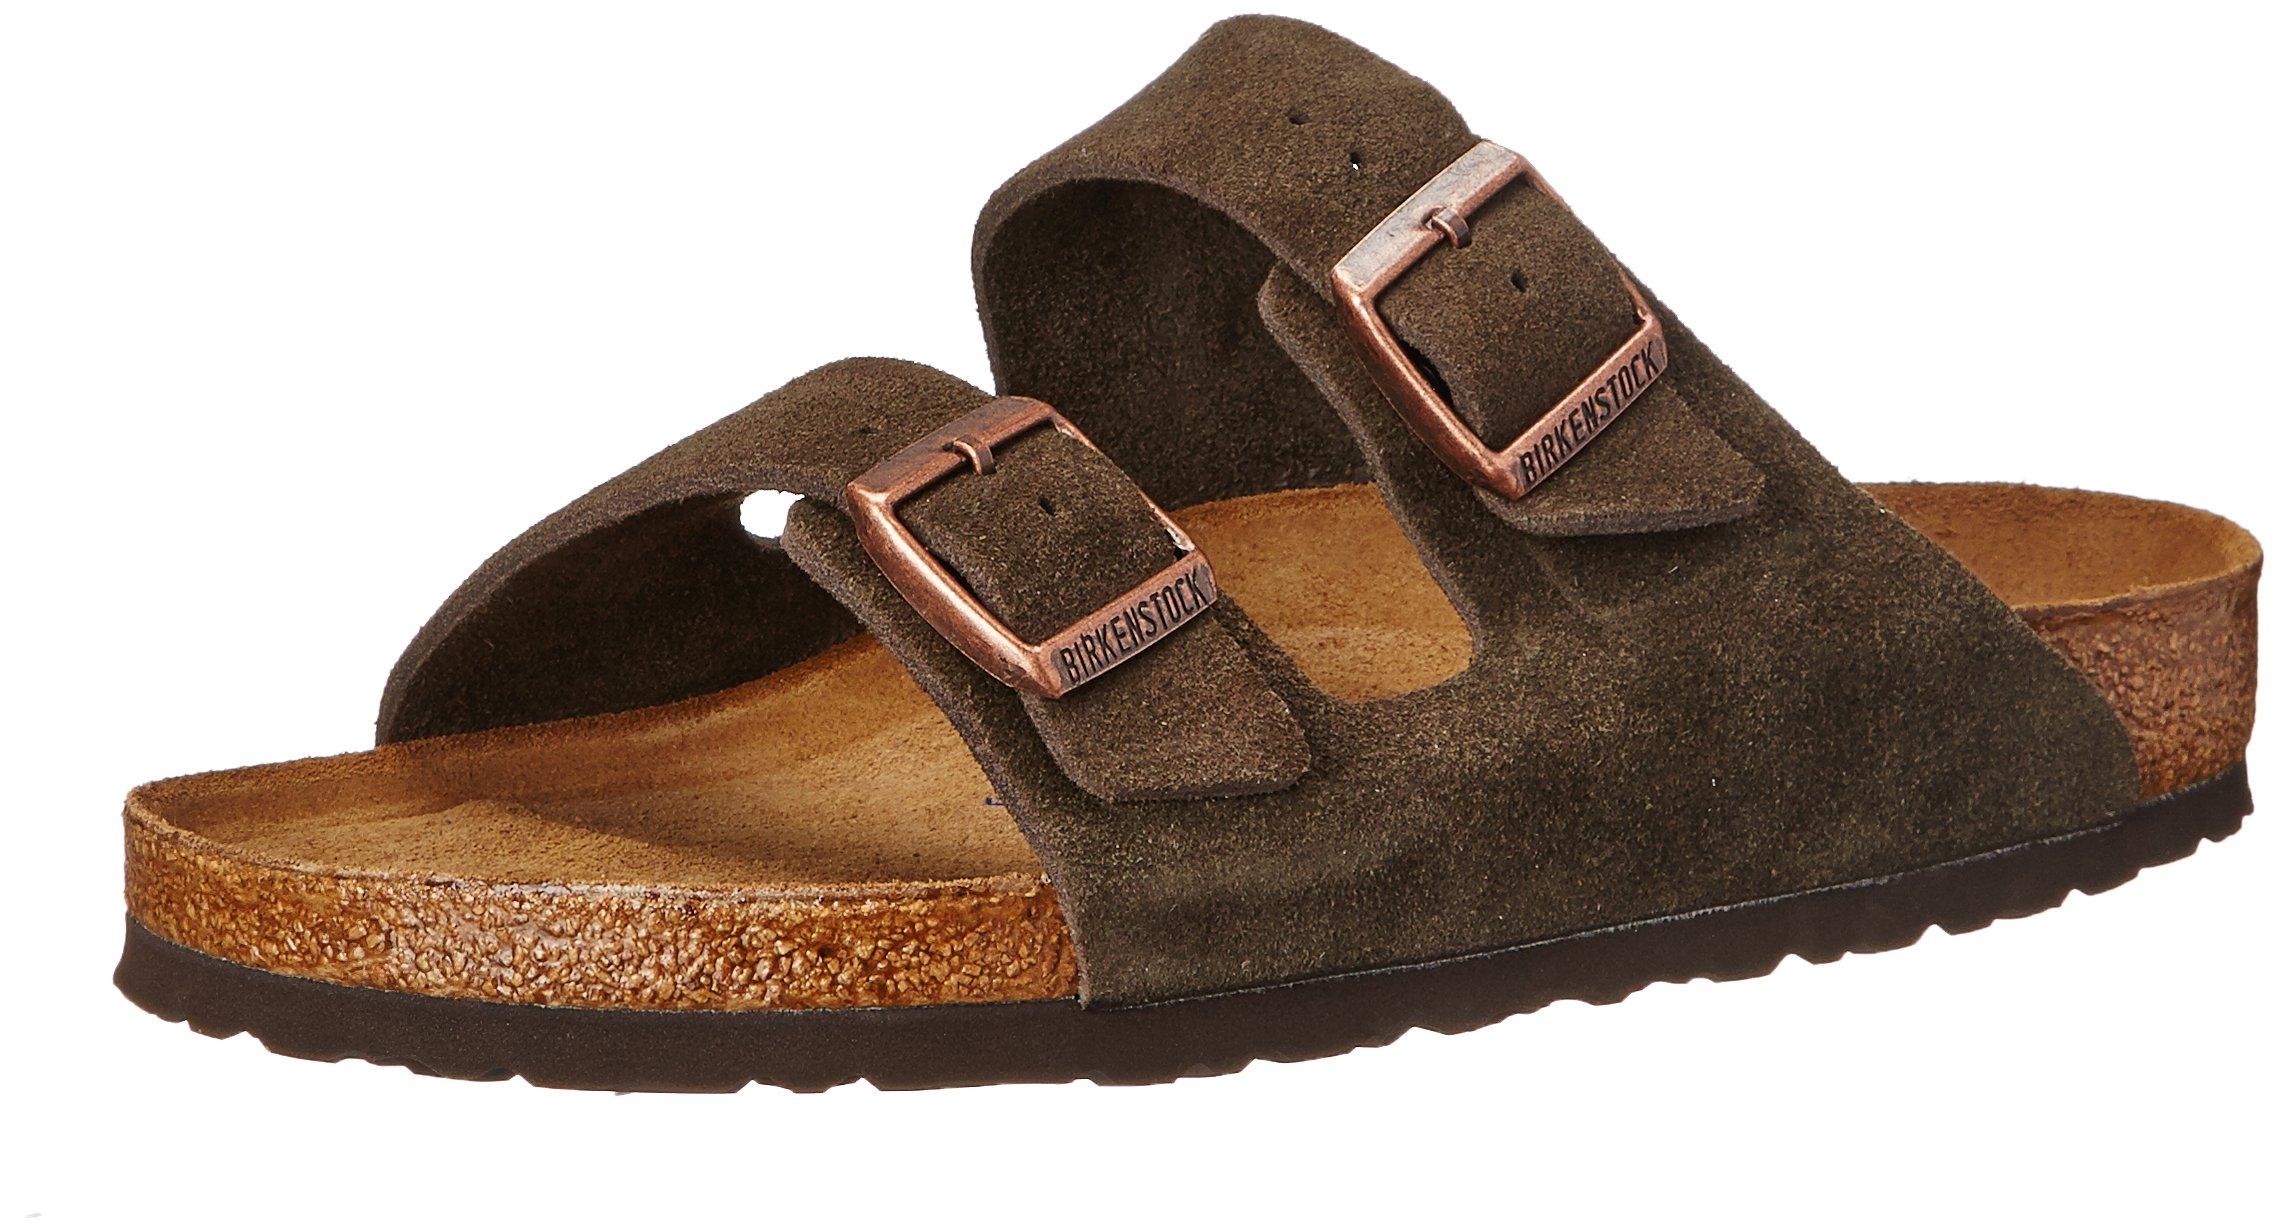 Birkenstock Unisex Arizona Mocha Suede Sandals - 44 N EU/11-11.5 2A(N) US Men